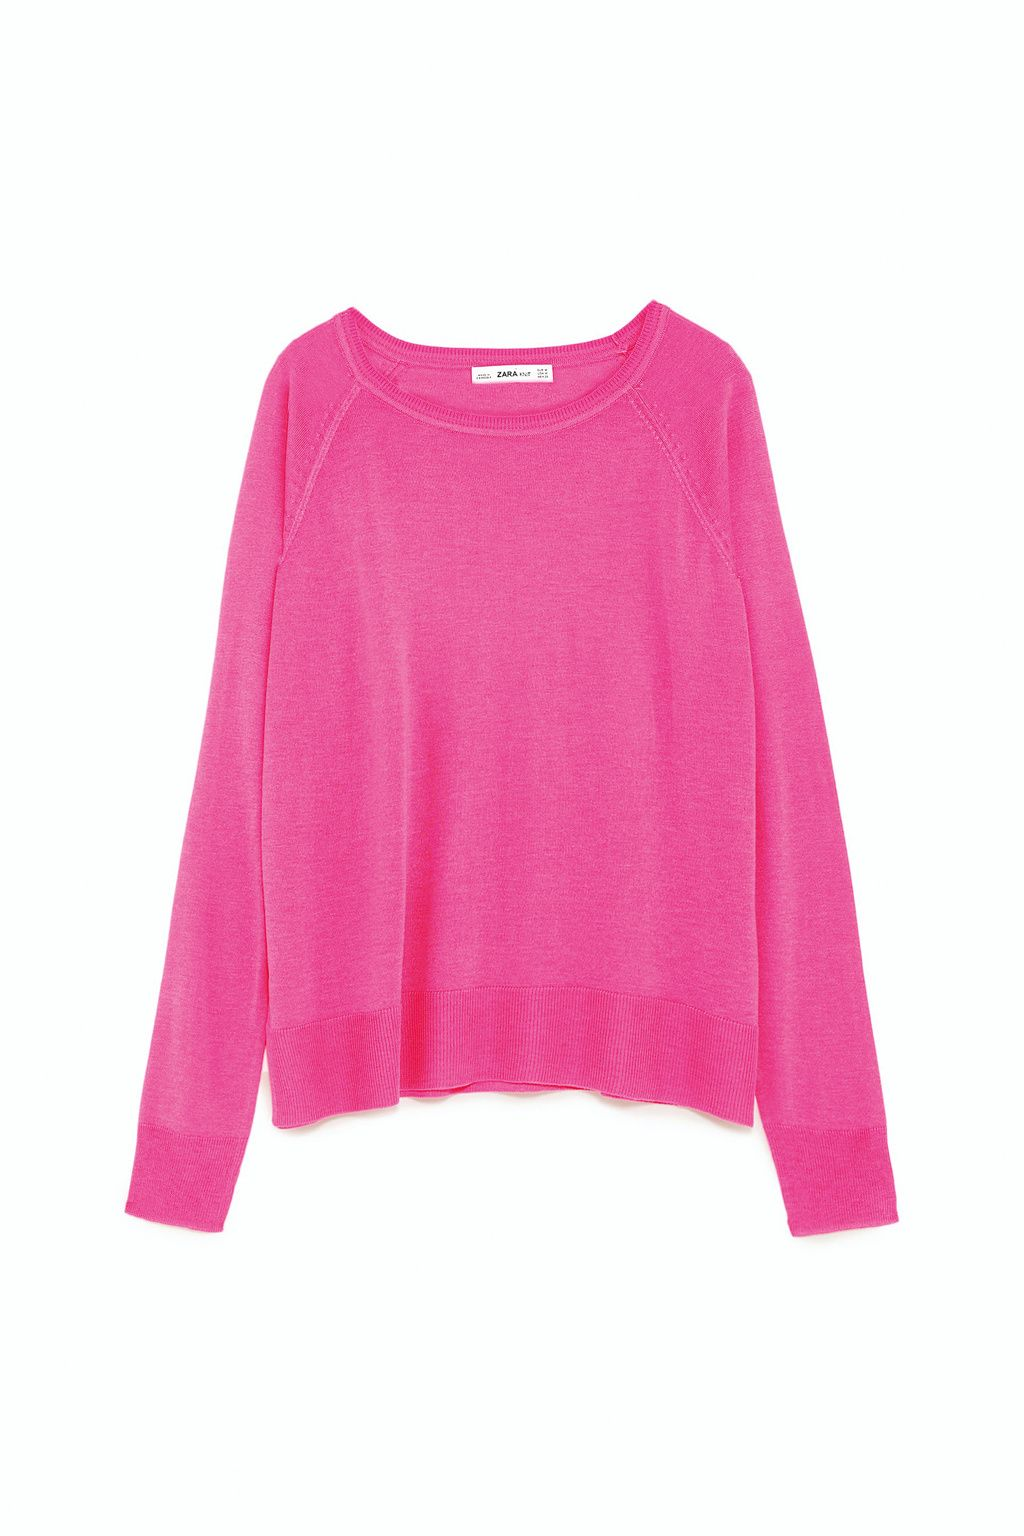 Jersey rosa de Zara.